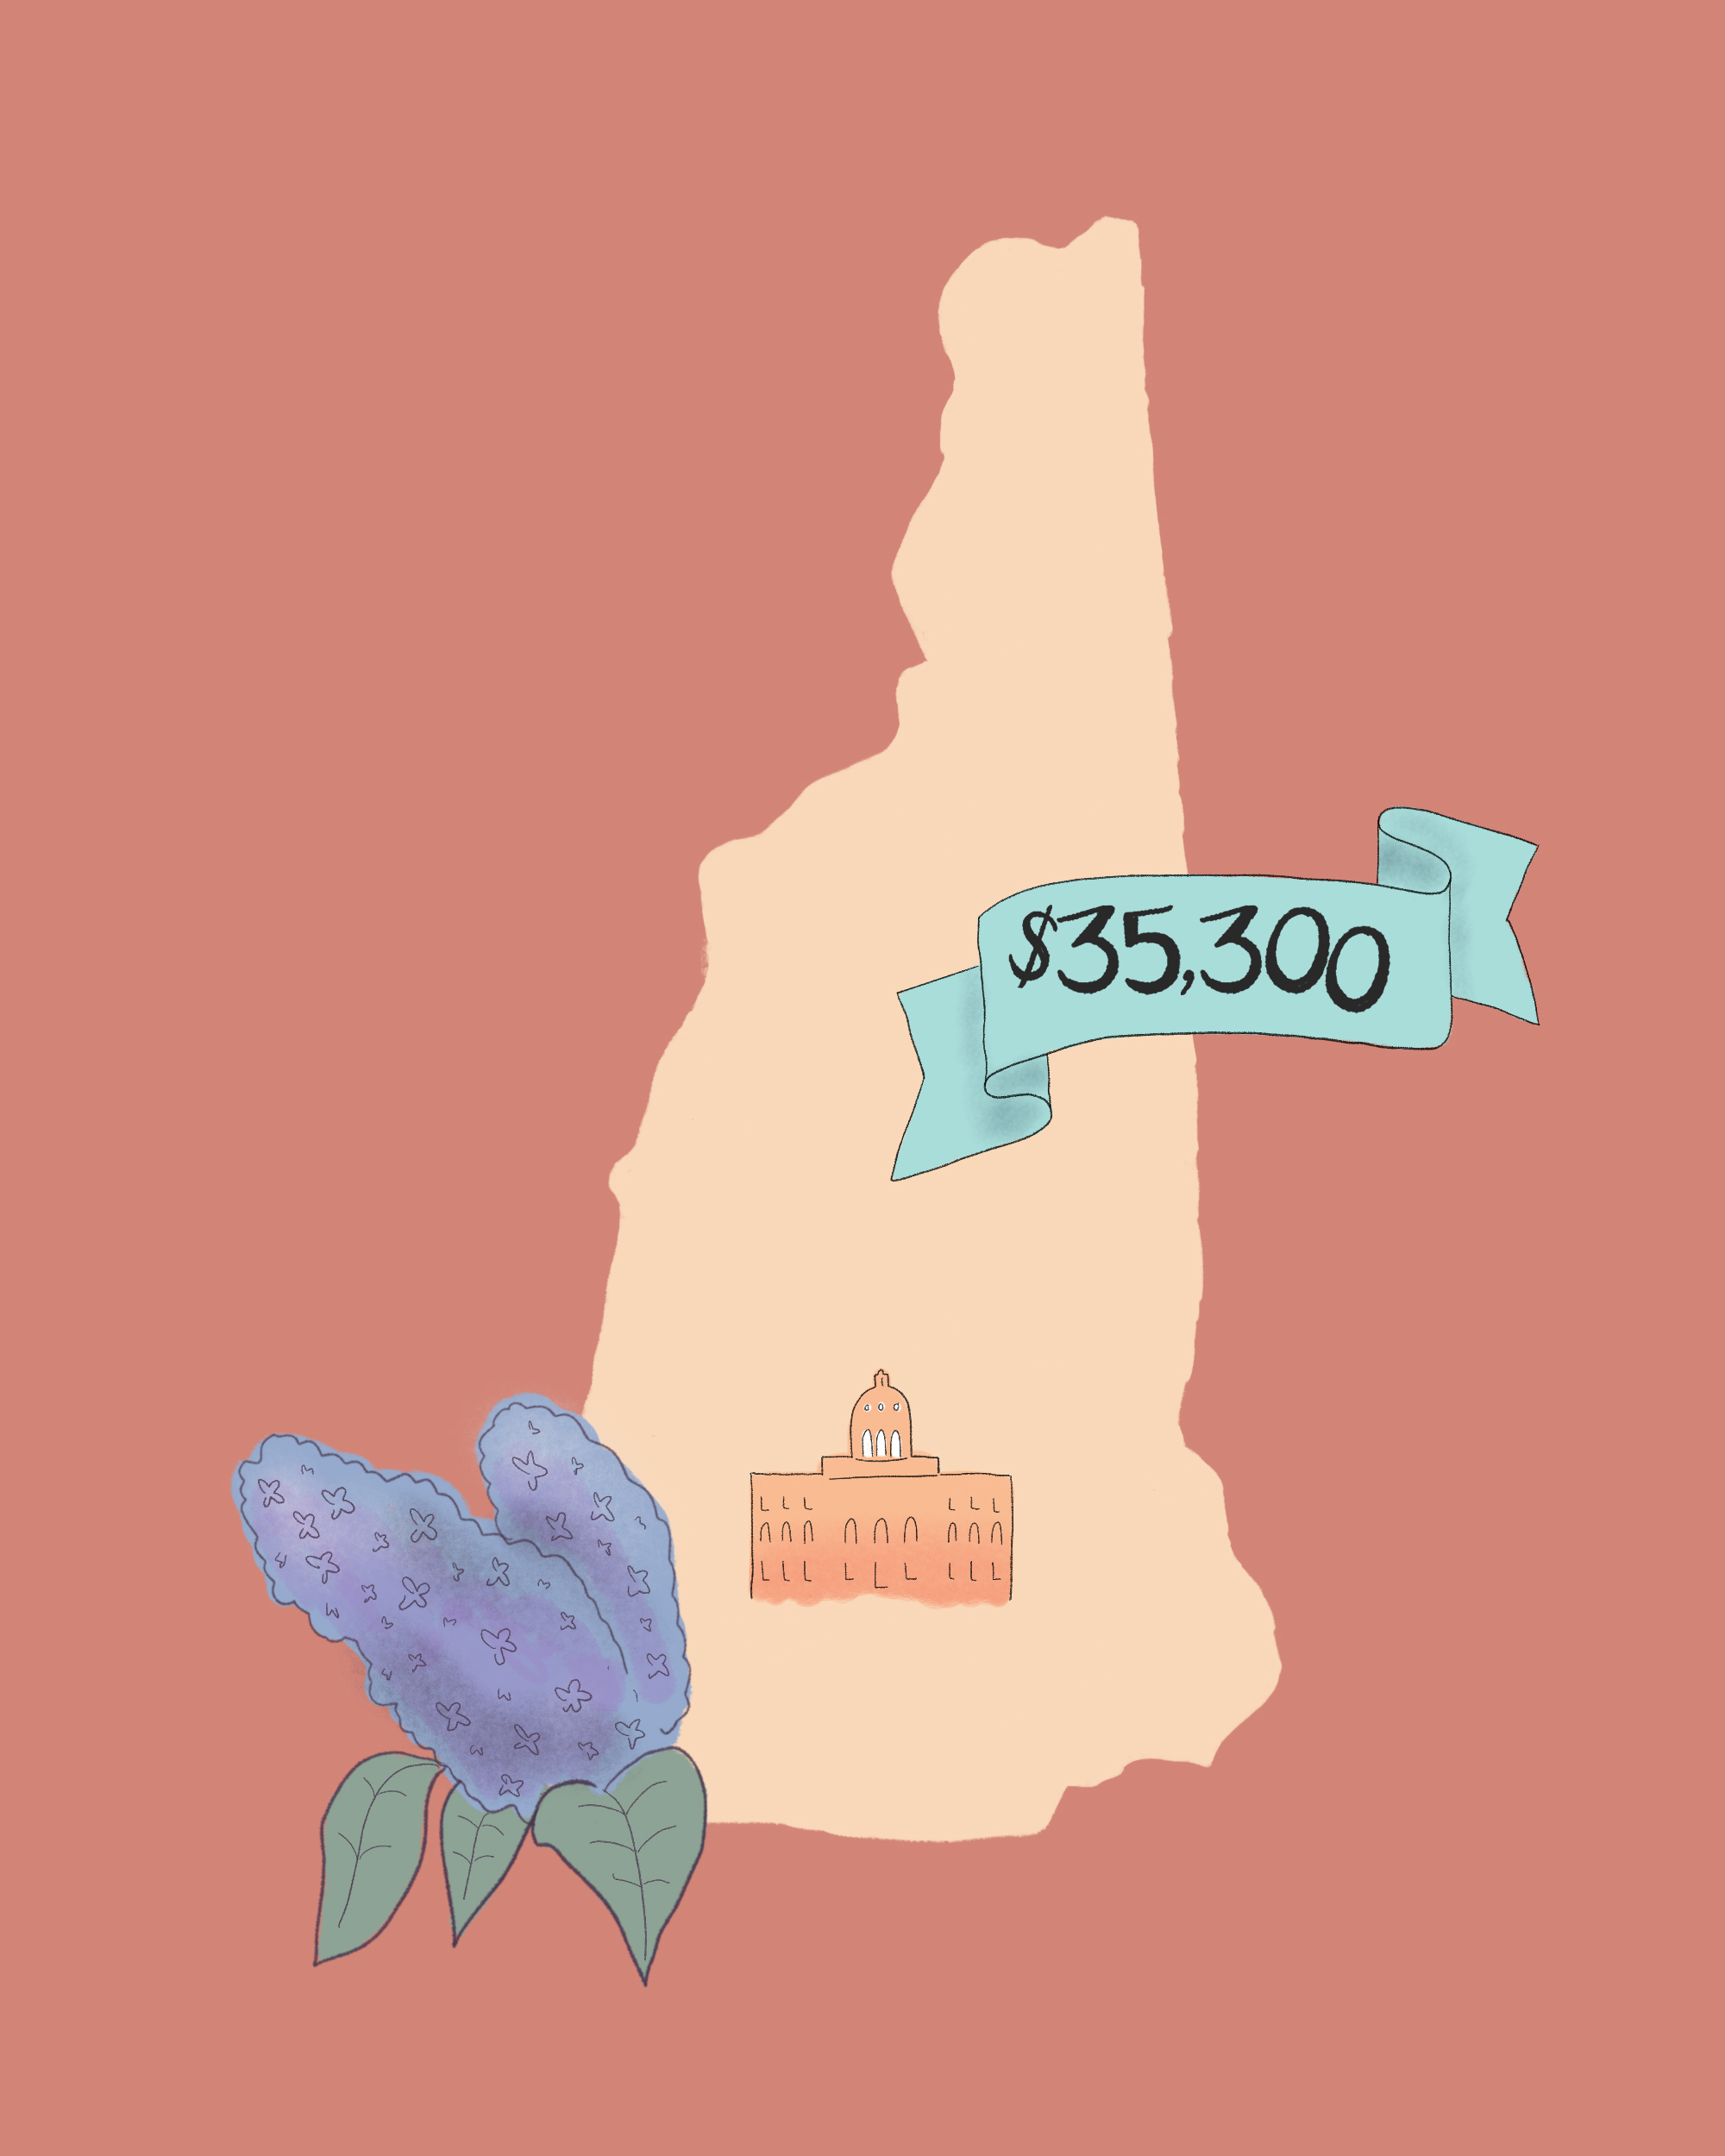 state wedding costs illustration new hampshire